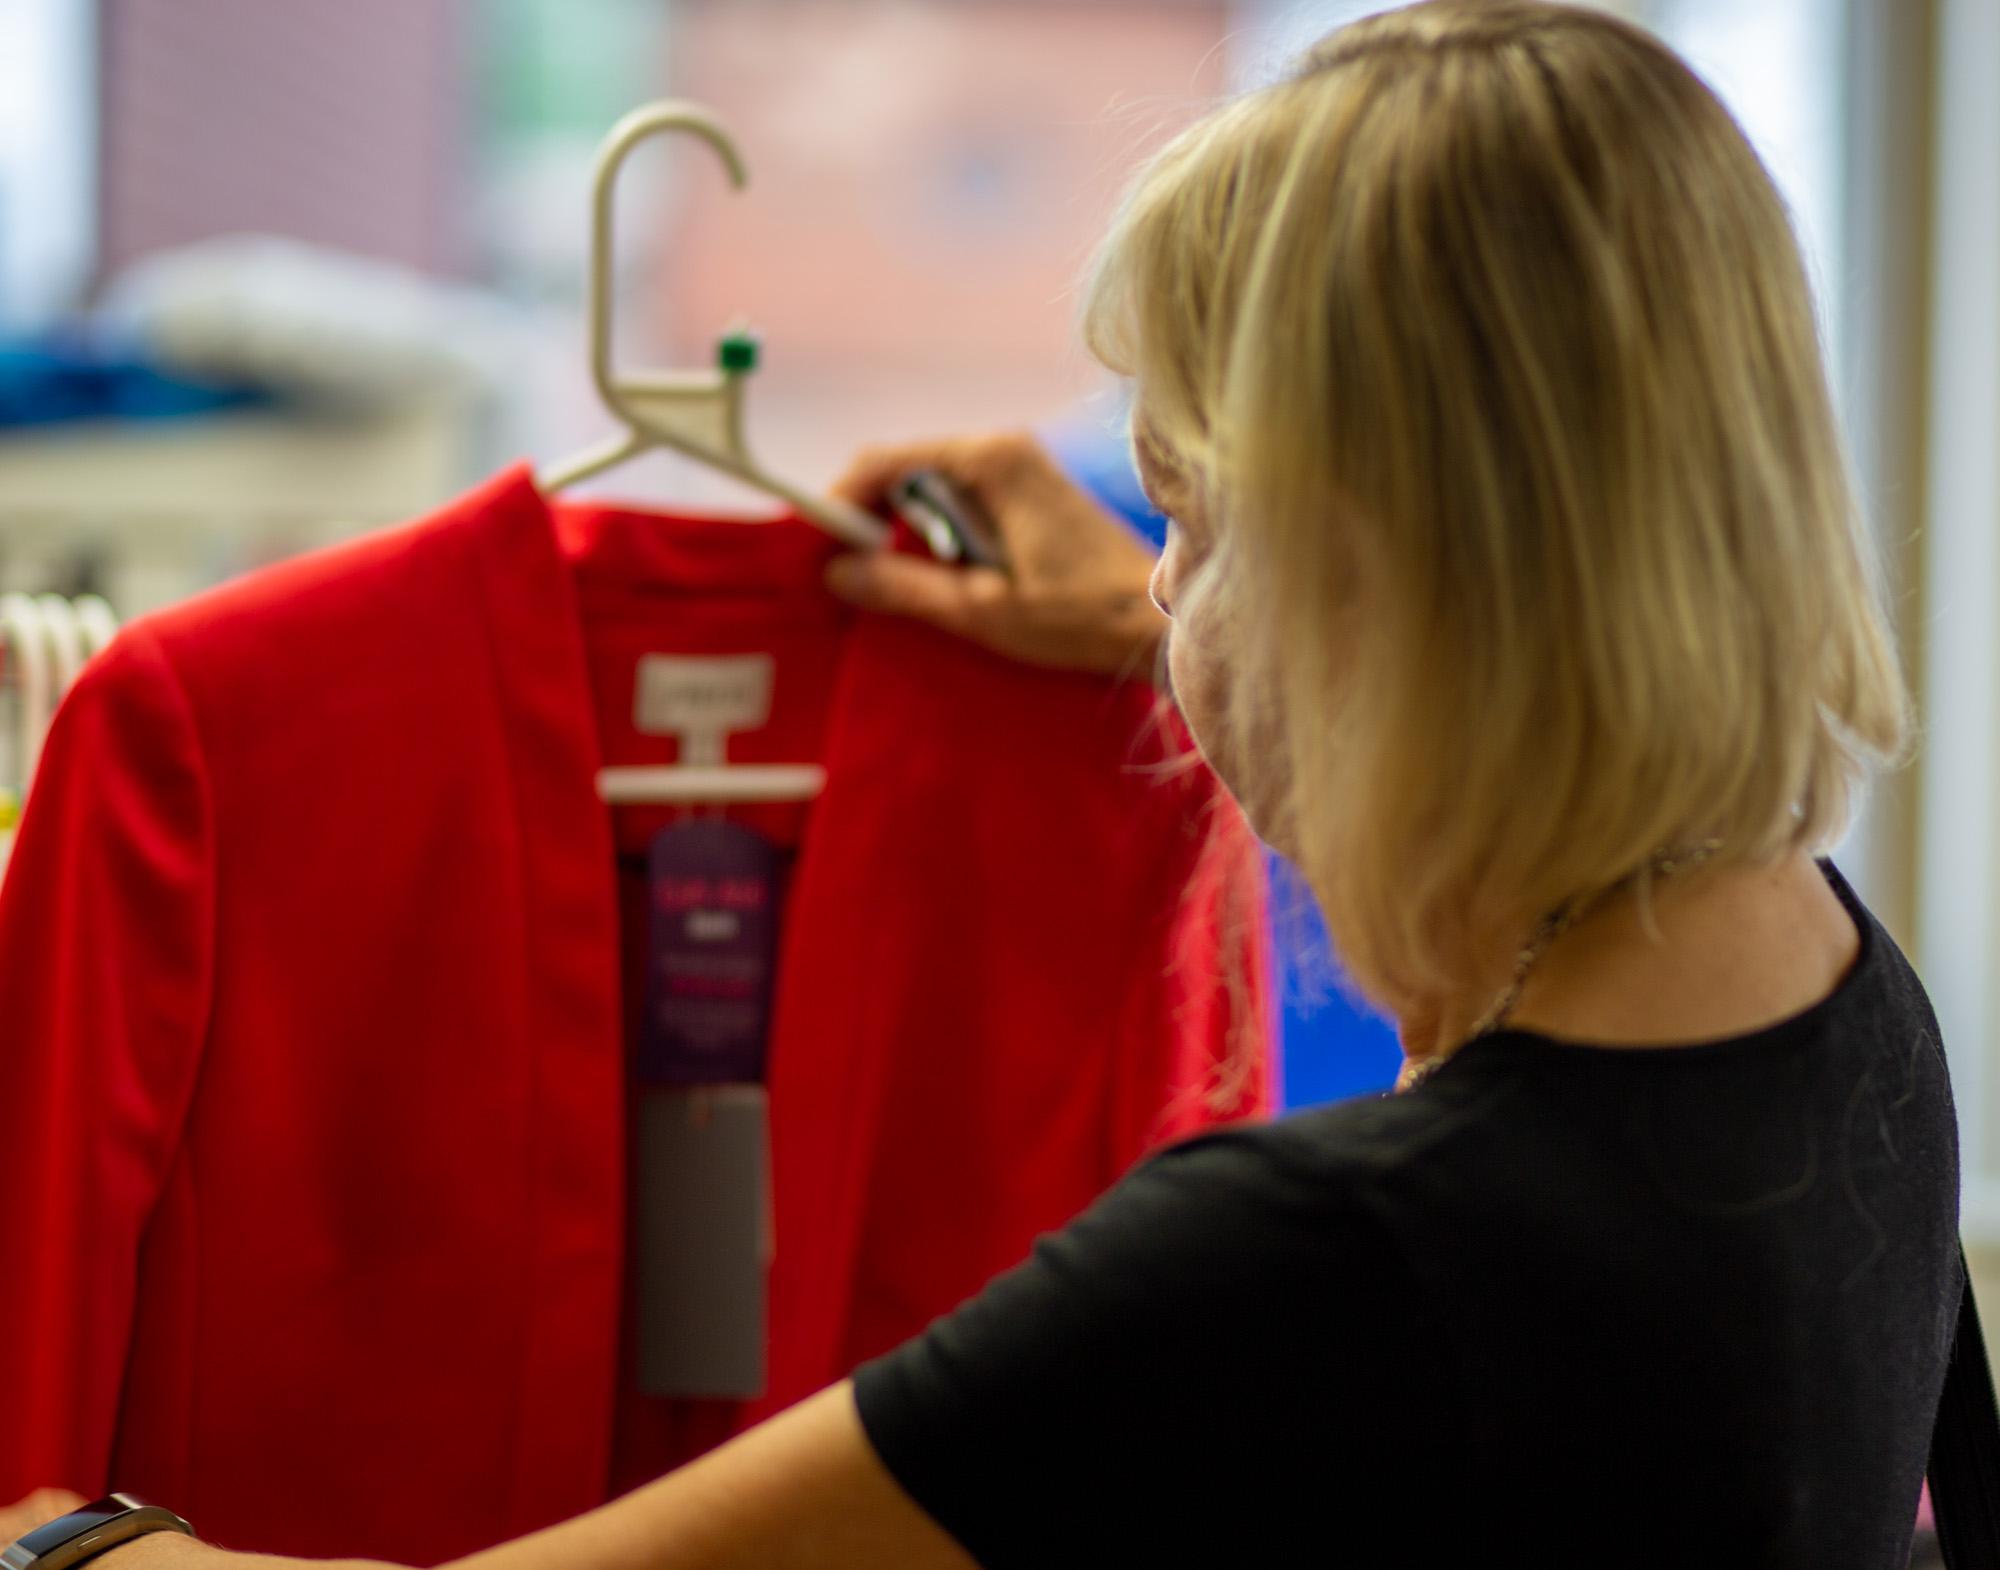 Shopper admiring red jacket